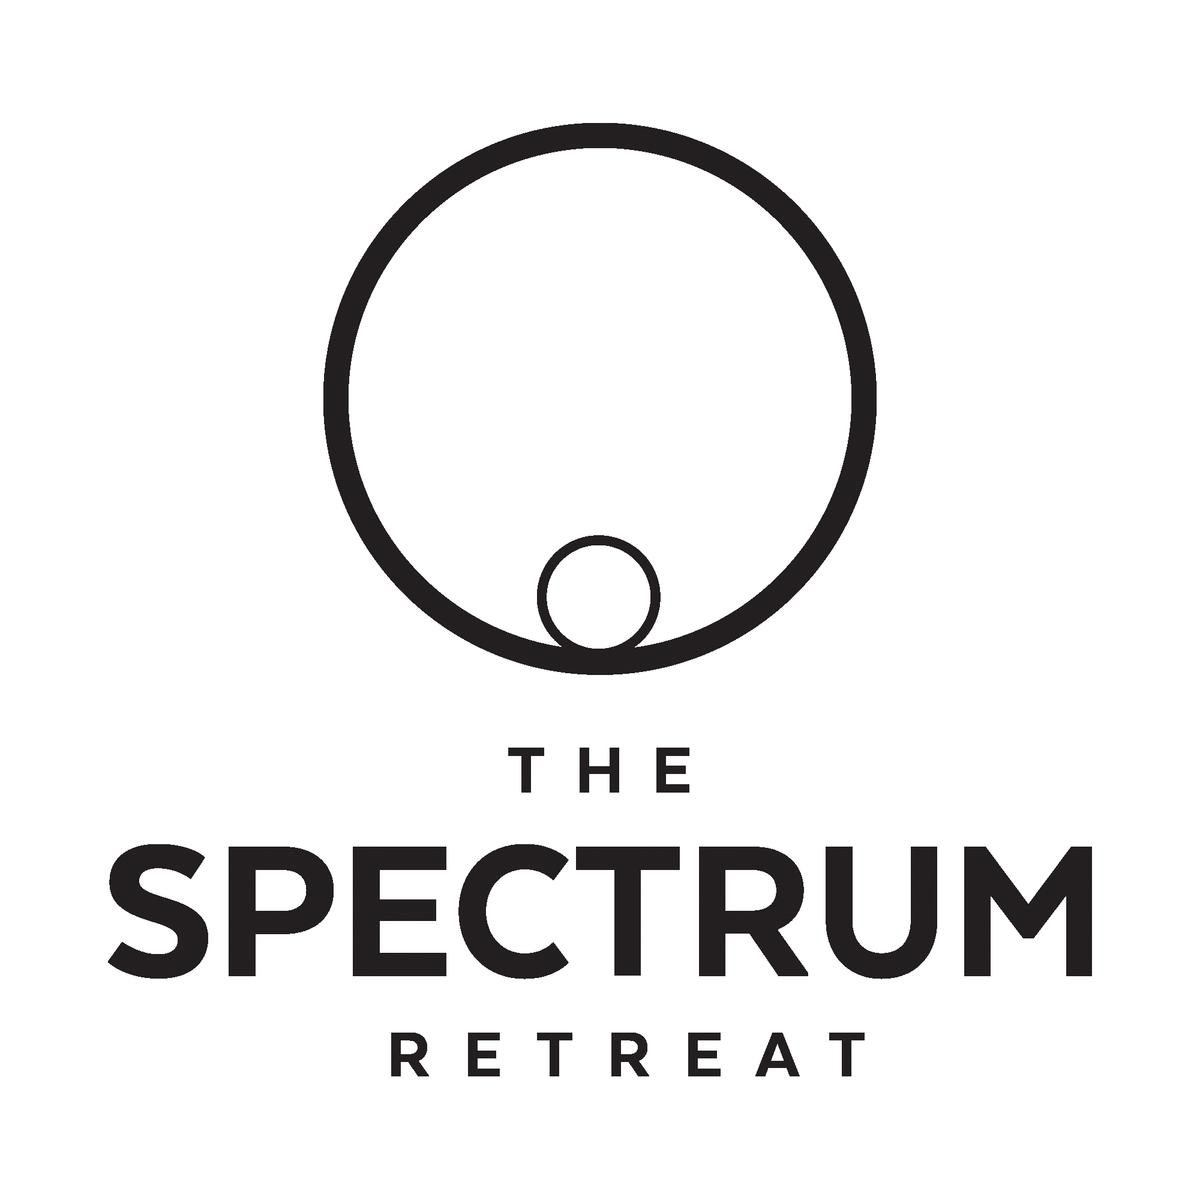 BAFTA winner The Spectrum Retreat comes to Switch next week